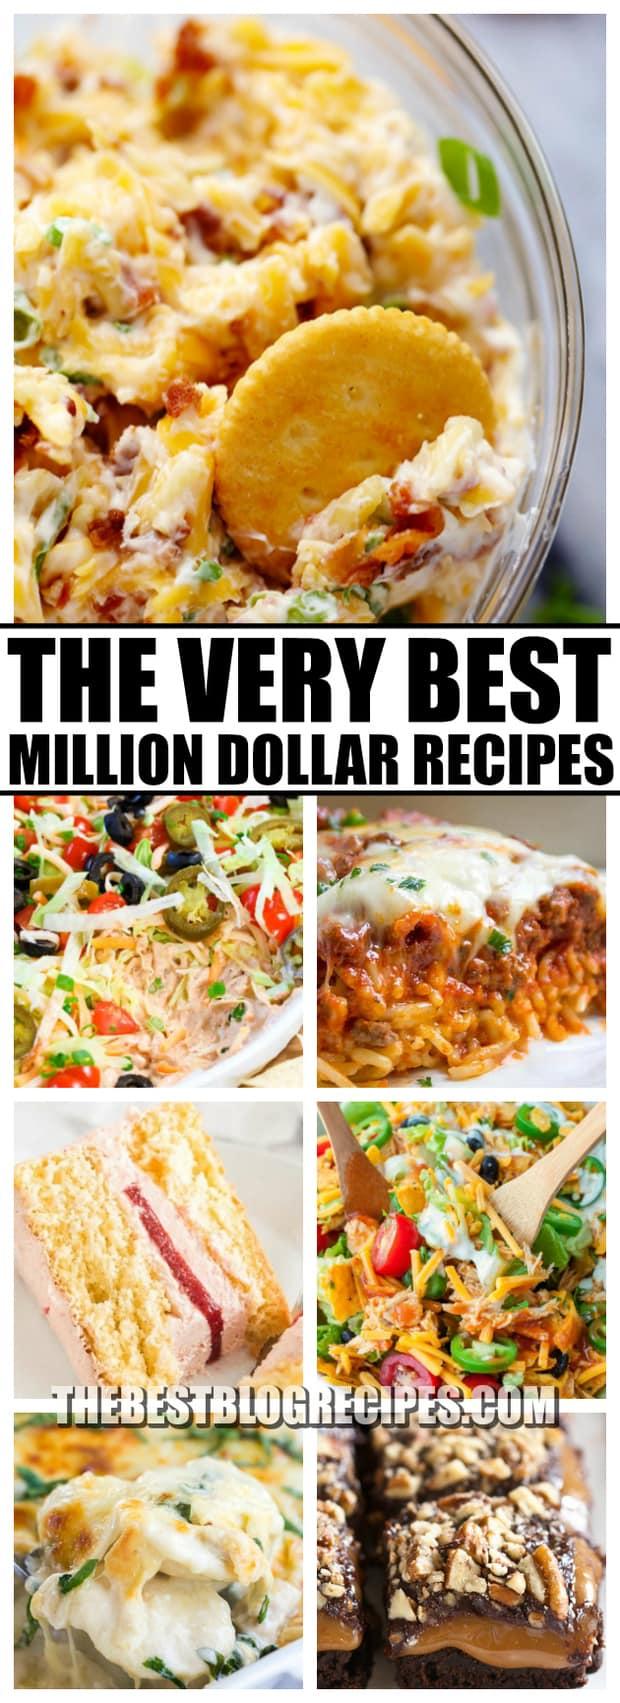 The Best Million Dollar Recipes